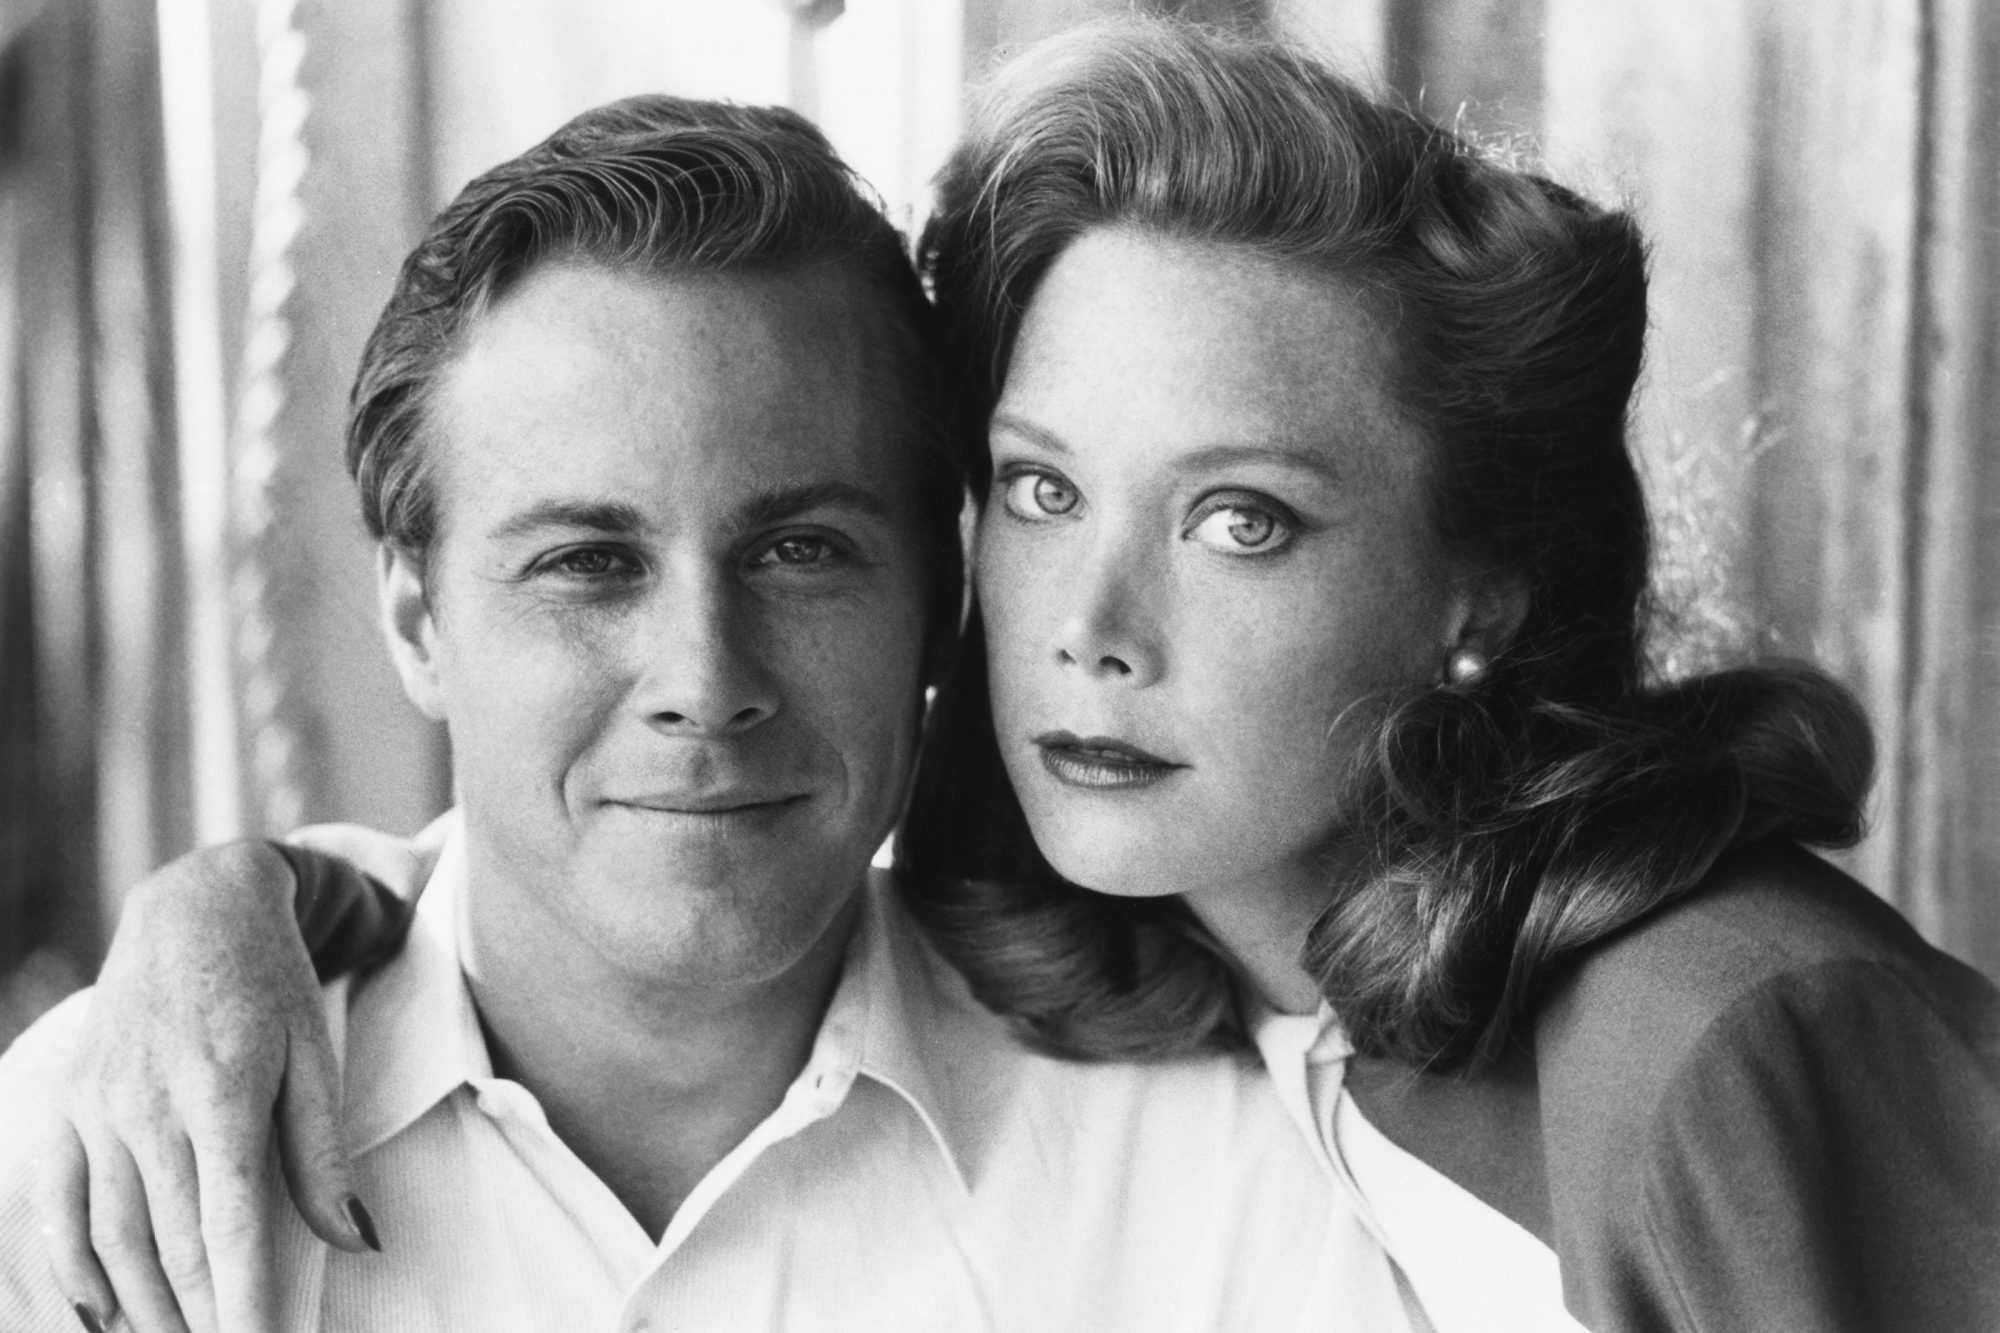 HEART BEAT, from left: John Heard as Jack Kerouac, Sissy Spacek, 1980, © Orion/courtesy Everett